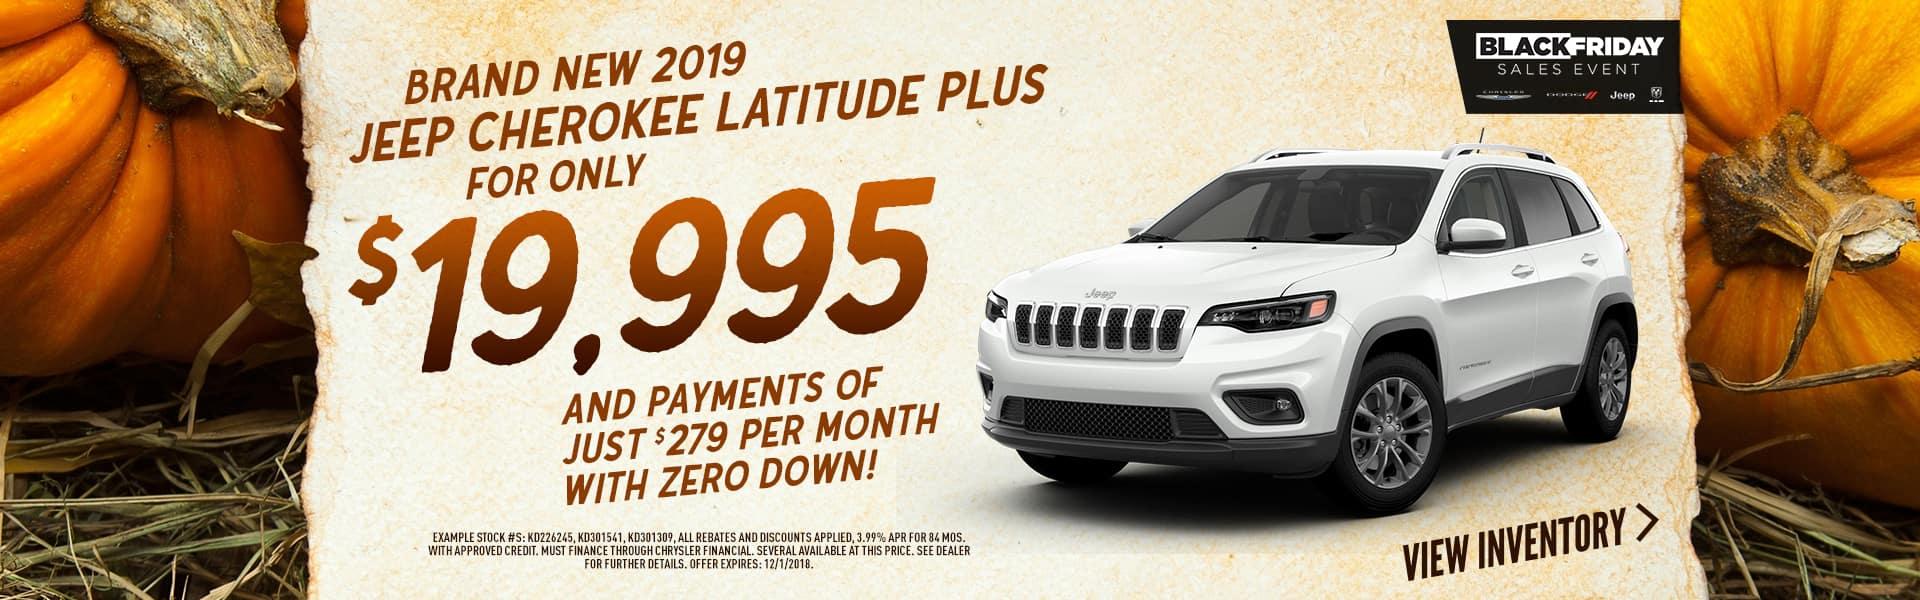 2019_jeep_cherokee_latitude_plus